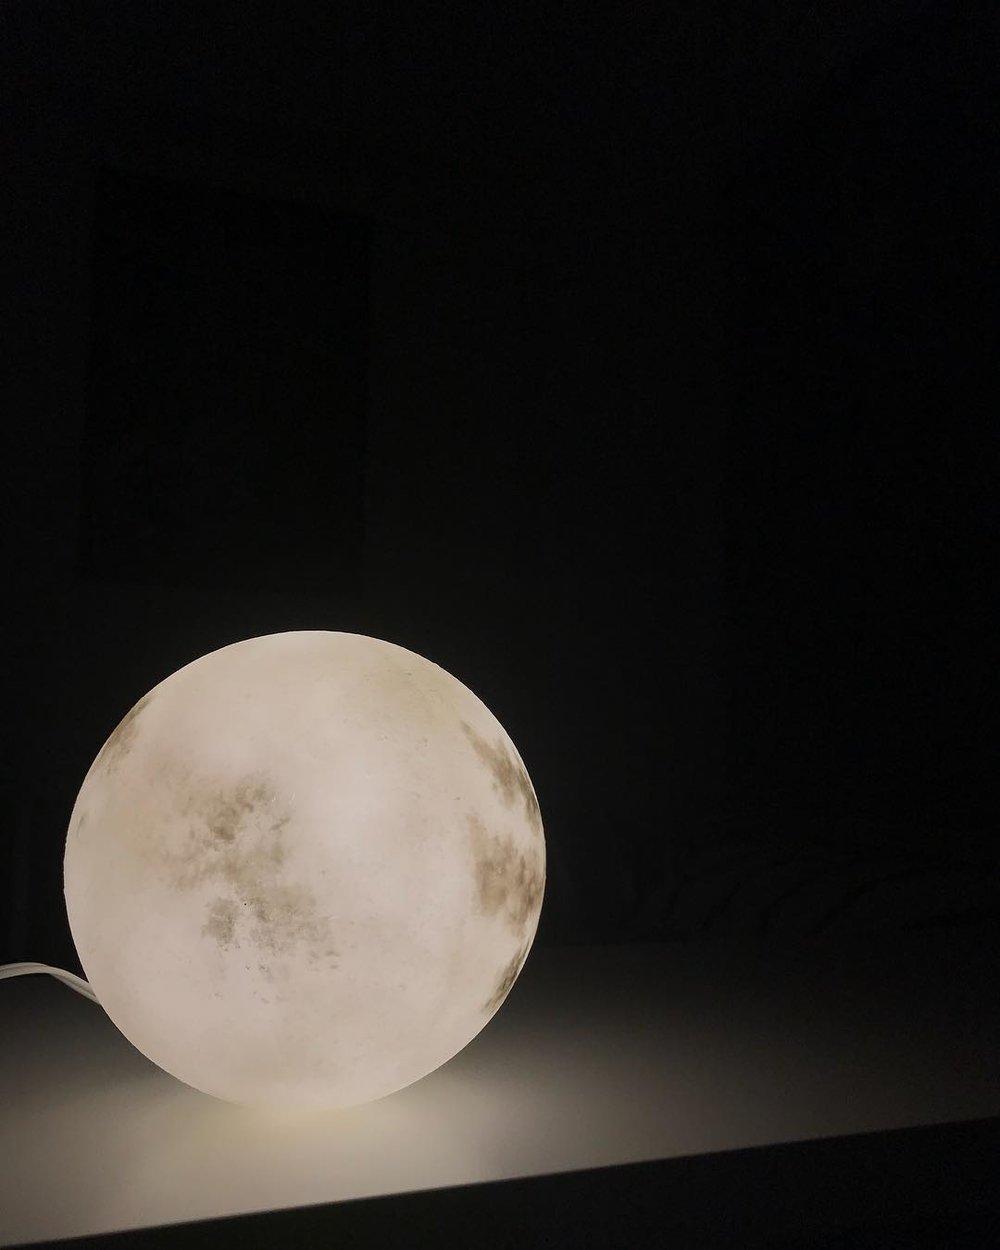 #lunalamp #月球燈luna #月亮燈#acornartstudio  photo by @thisisrexlife